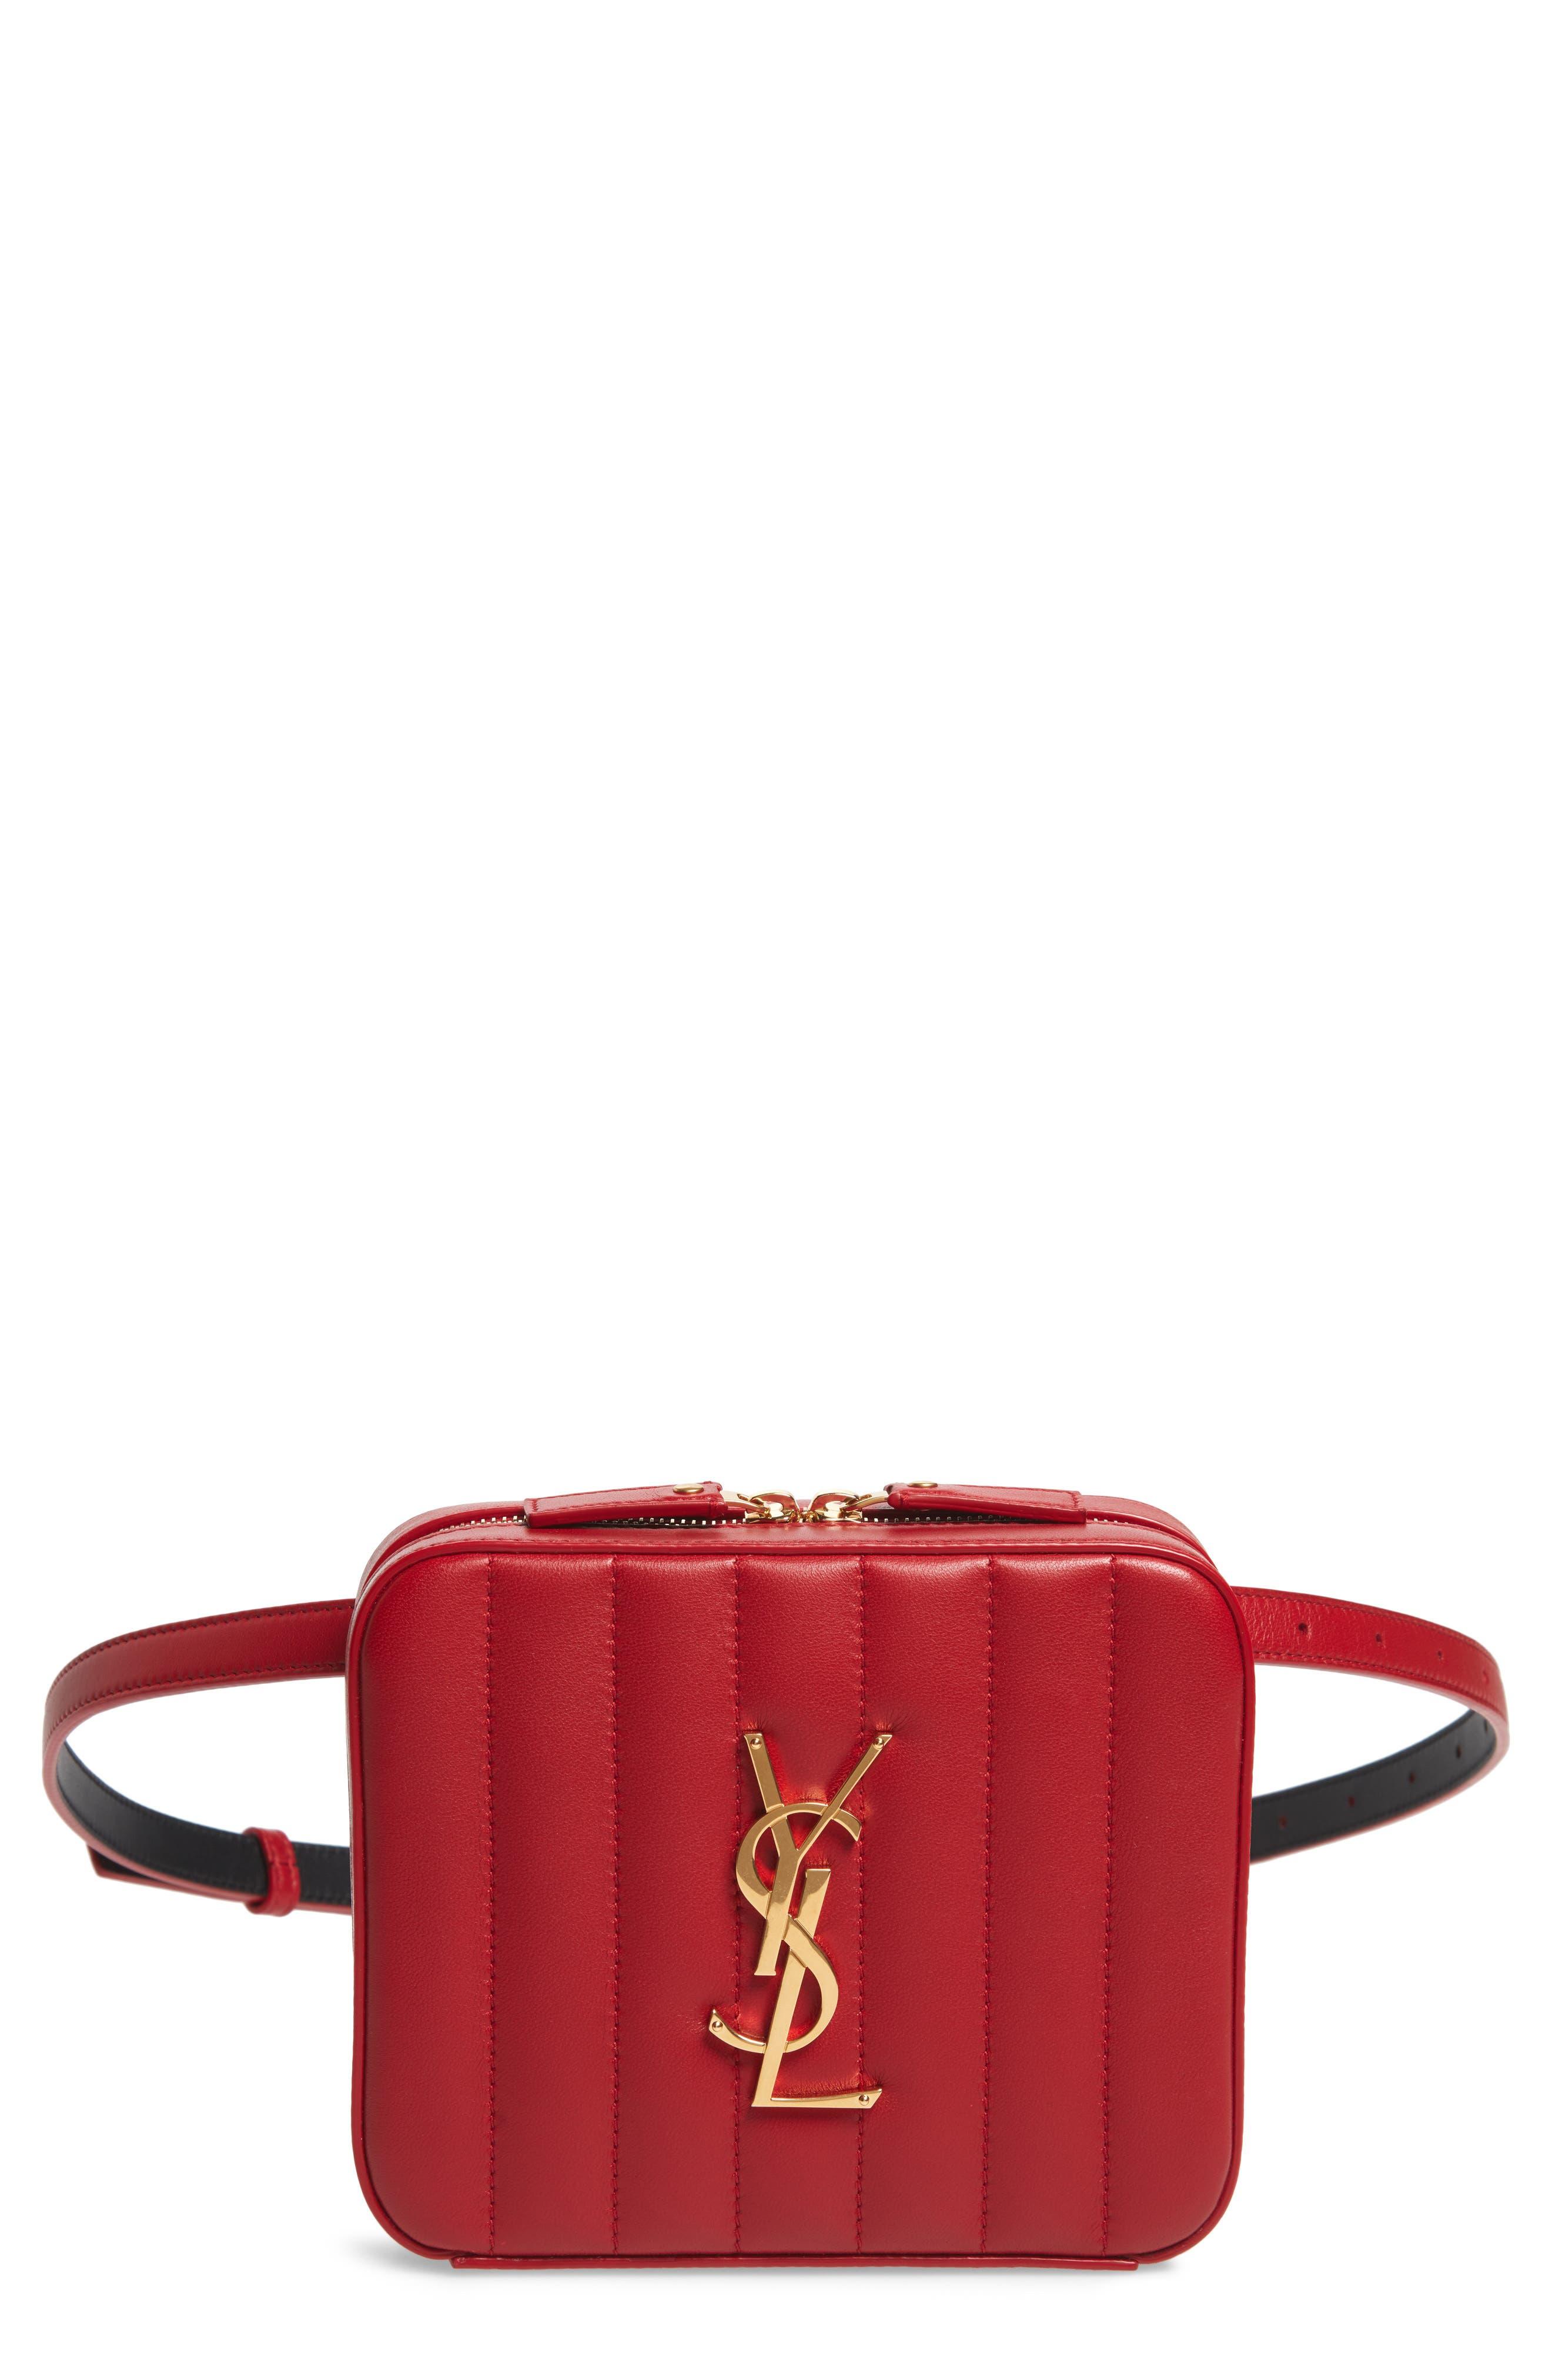 SAINT LAURENT Vicky Lambskin Leather Belt Bag, Main, color, ROUGE EROS